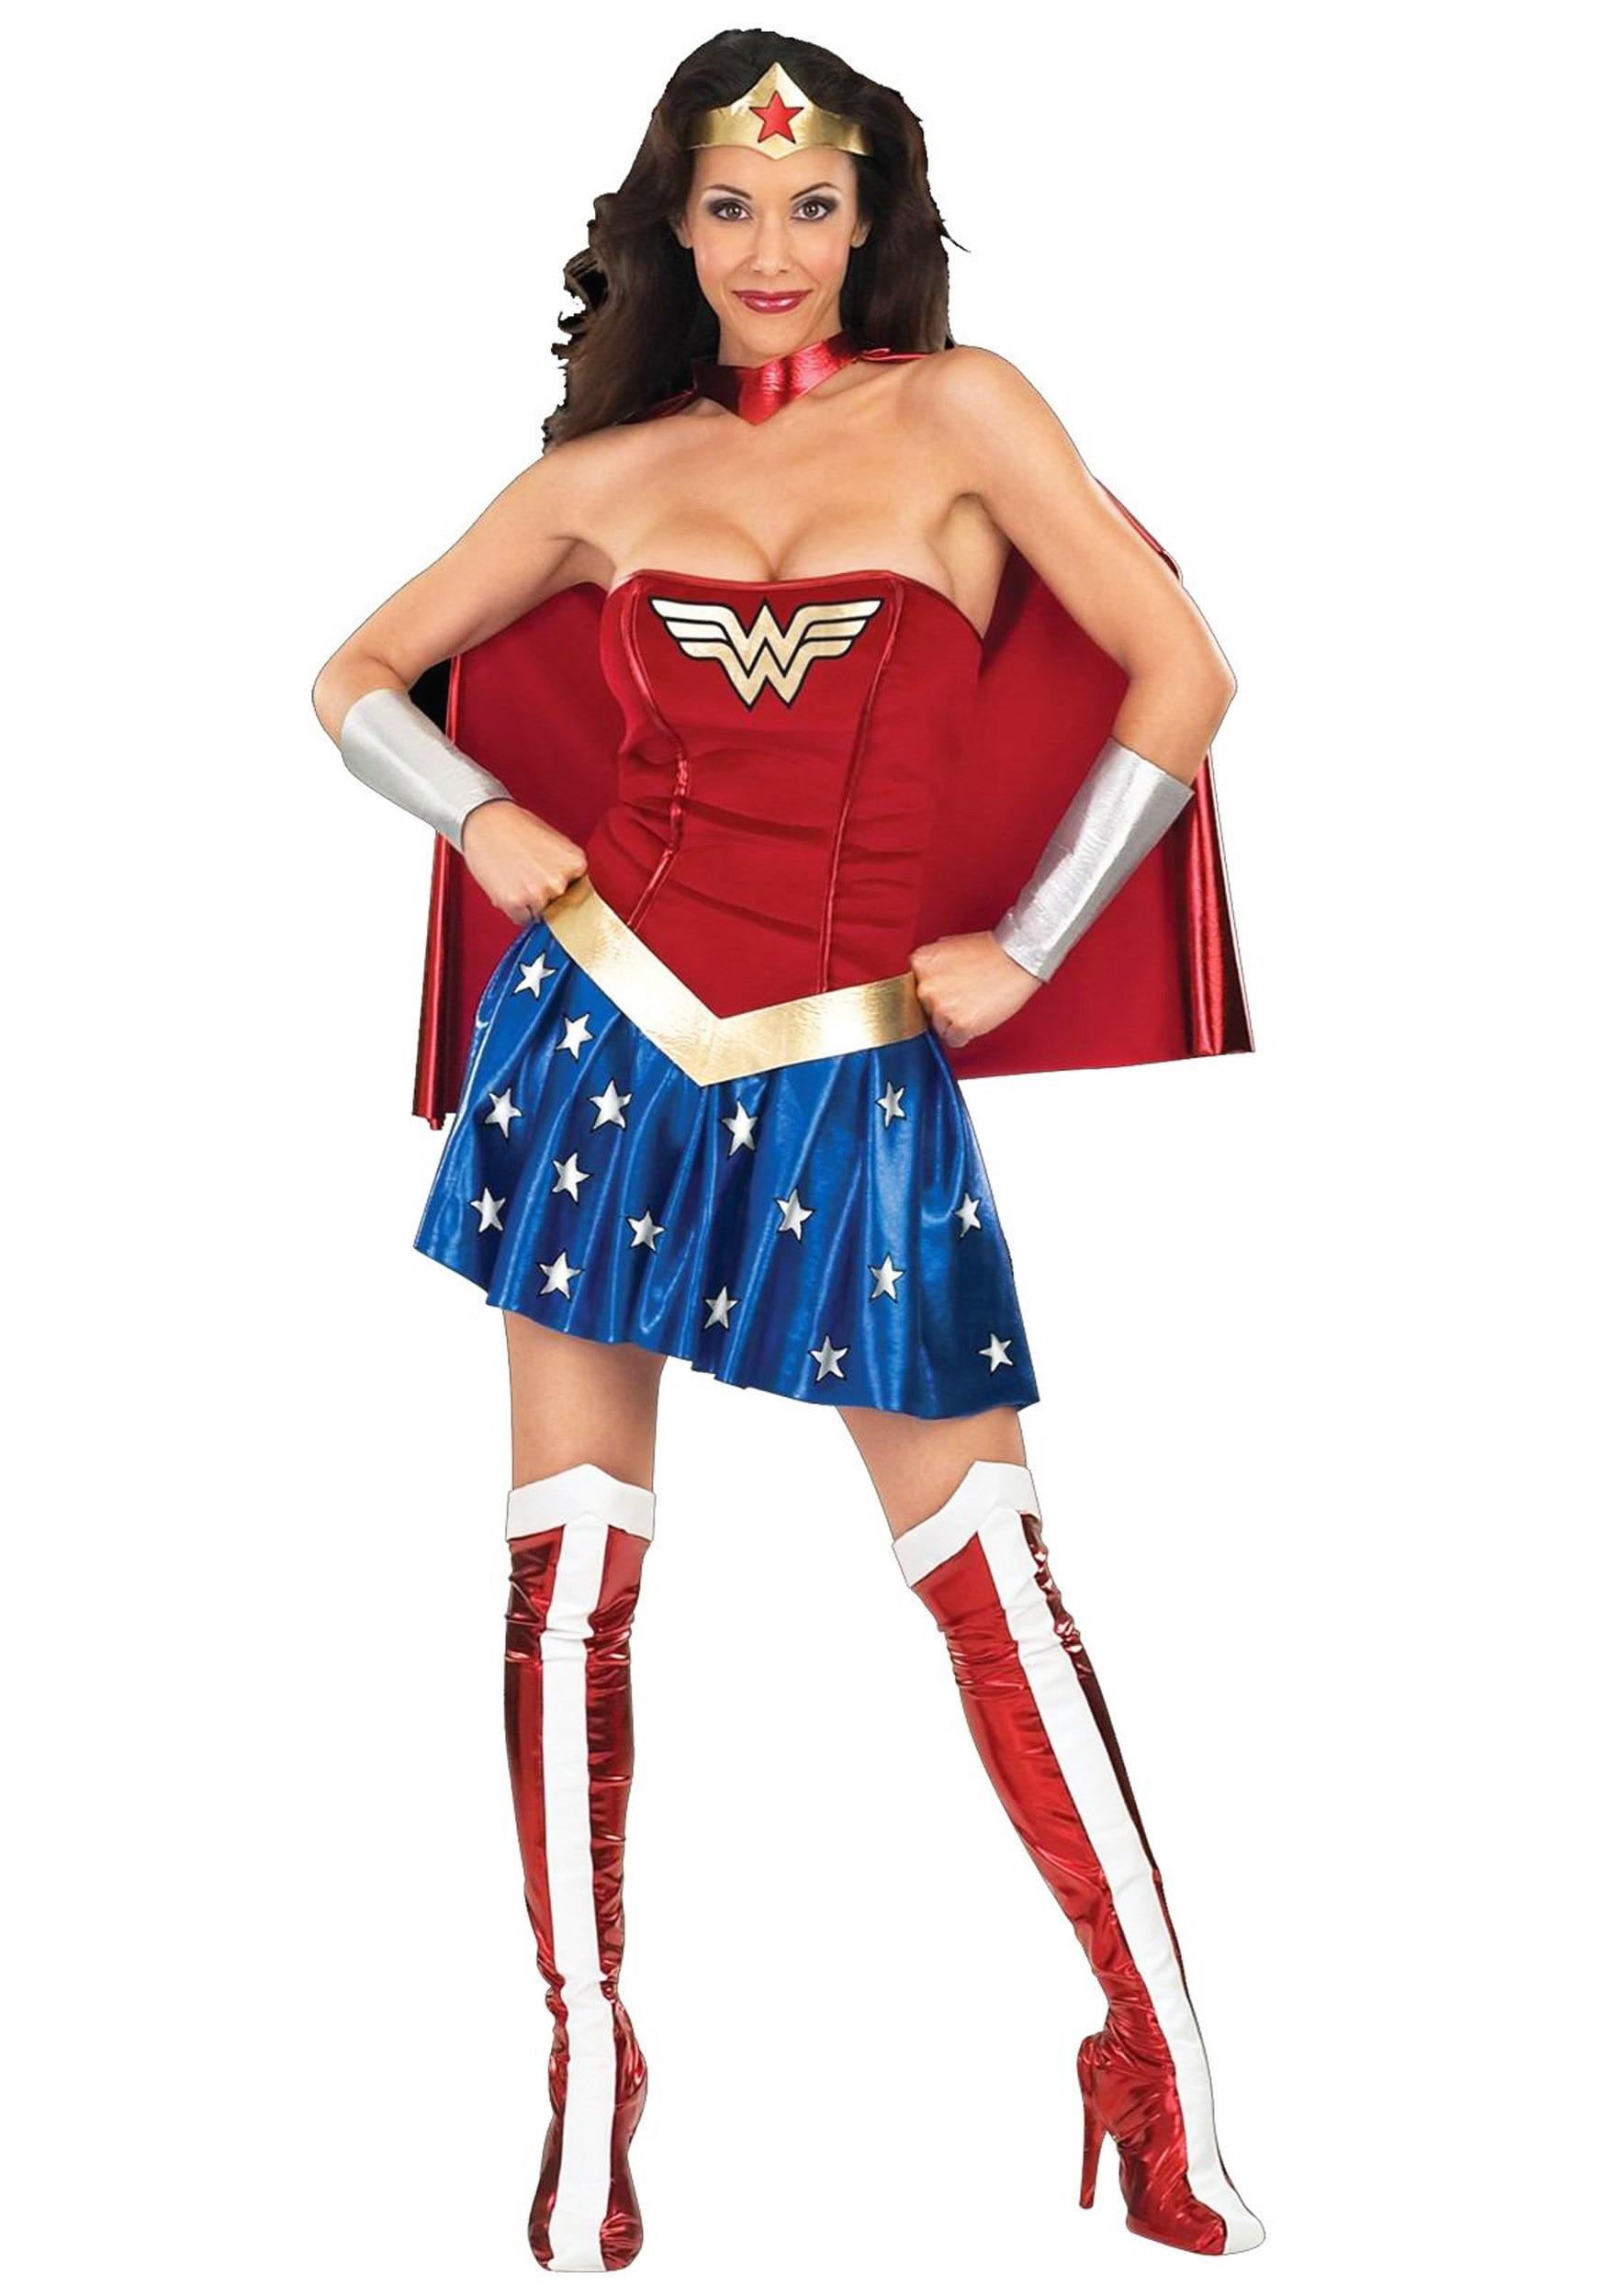 Adult Women Supergirl Superhero Wonder Woman Costume Halloween Fancy Dress